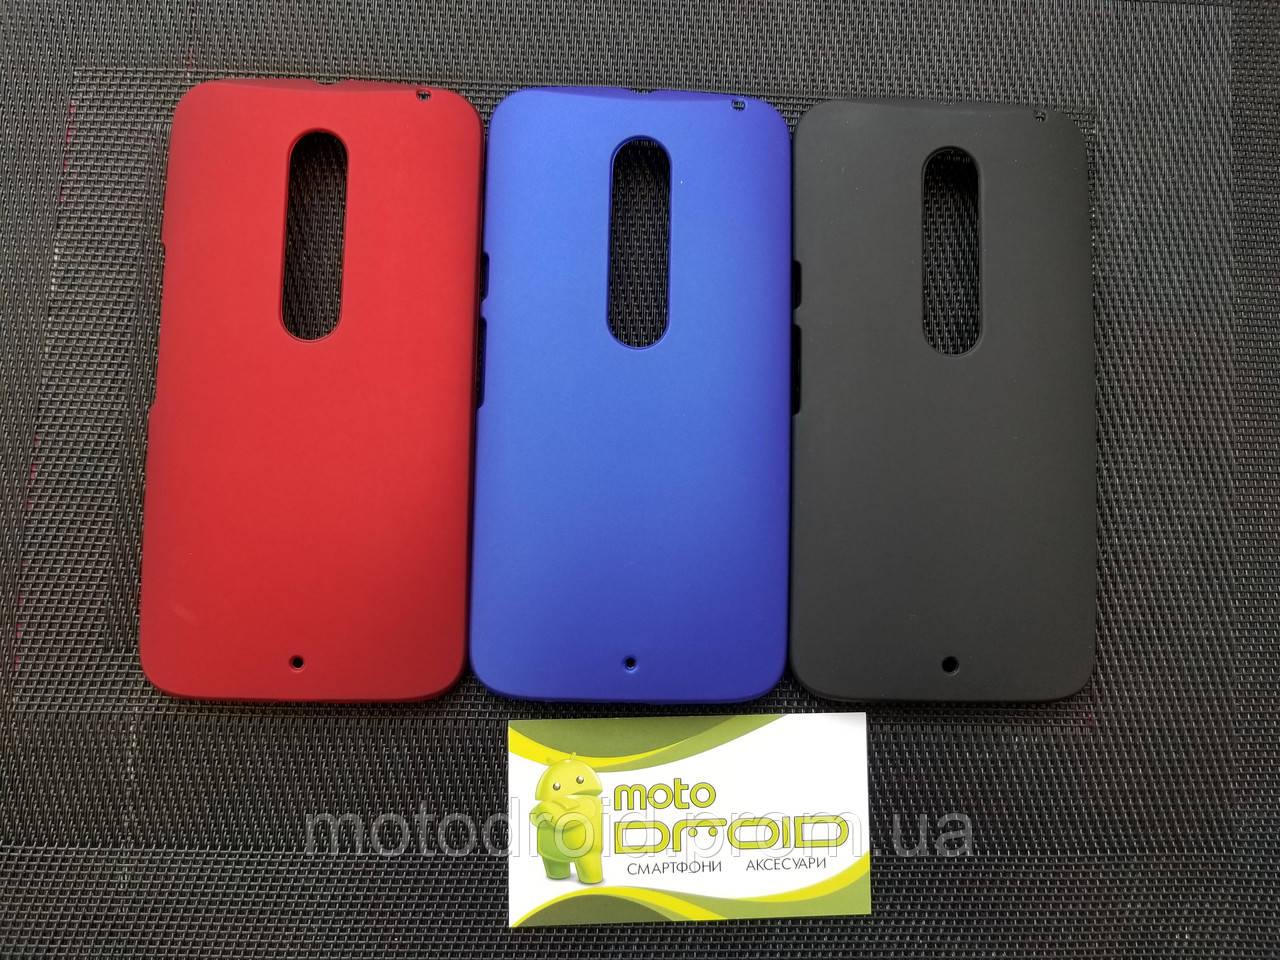 ЧОХОЛНАMOTOROLA Moto X Pure Edition / Moto X-Style